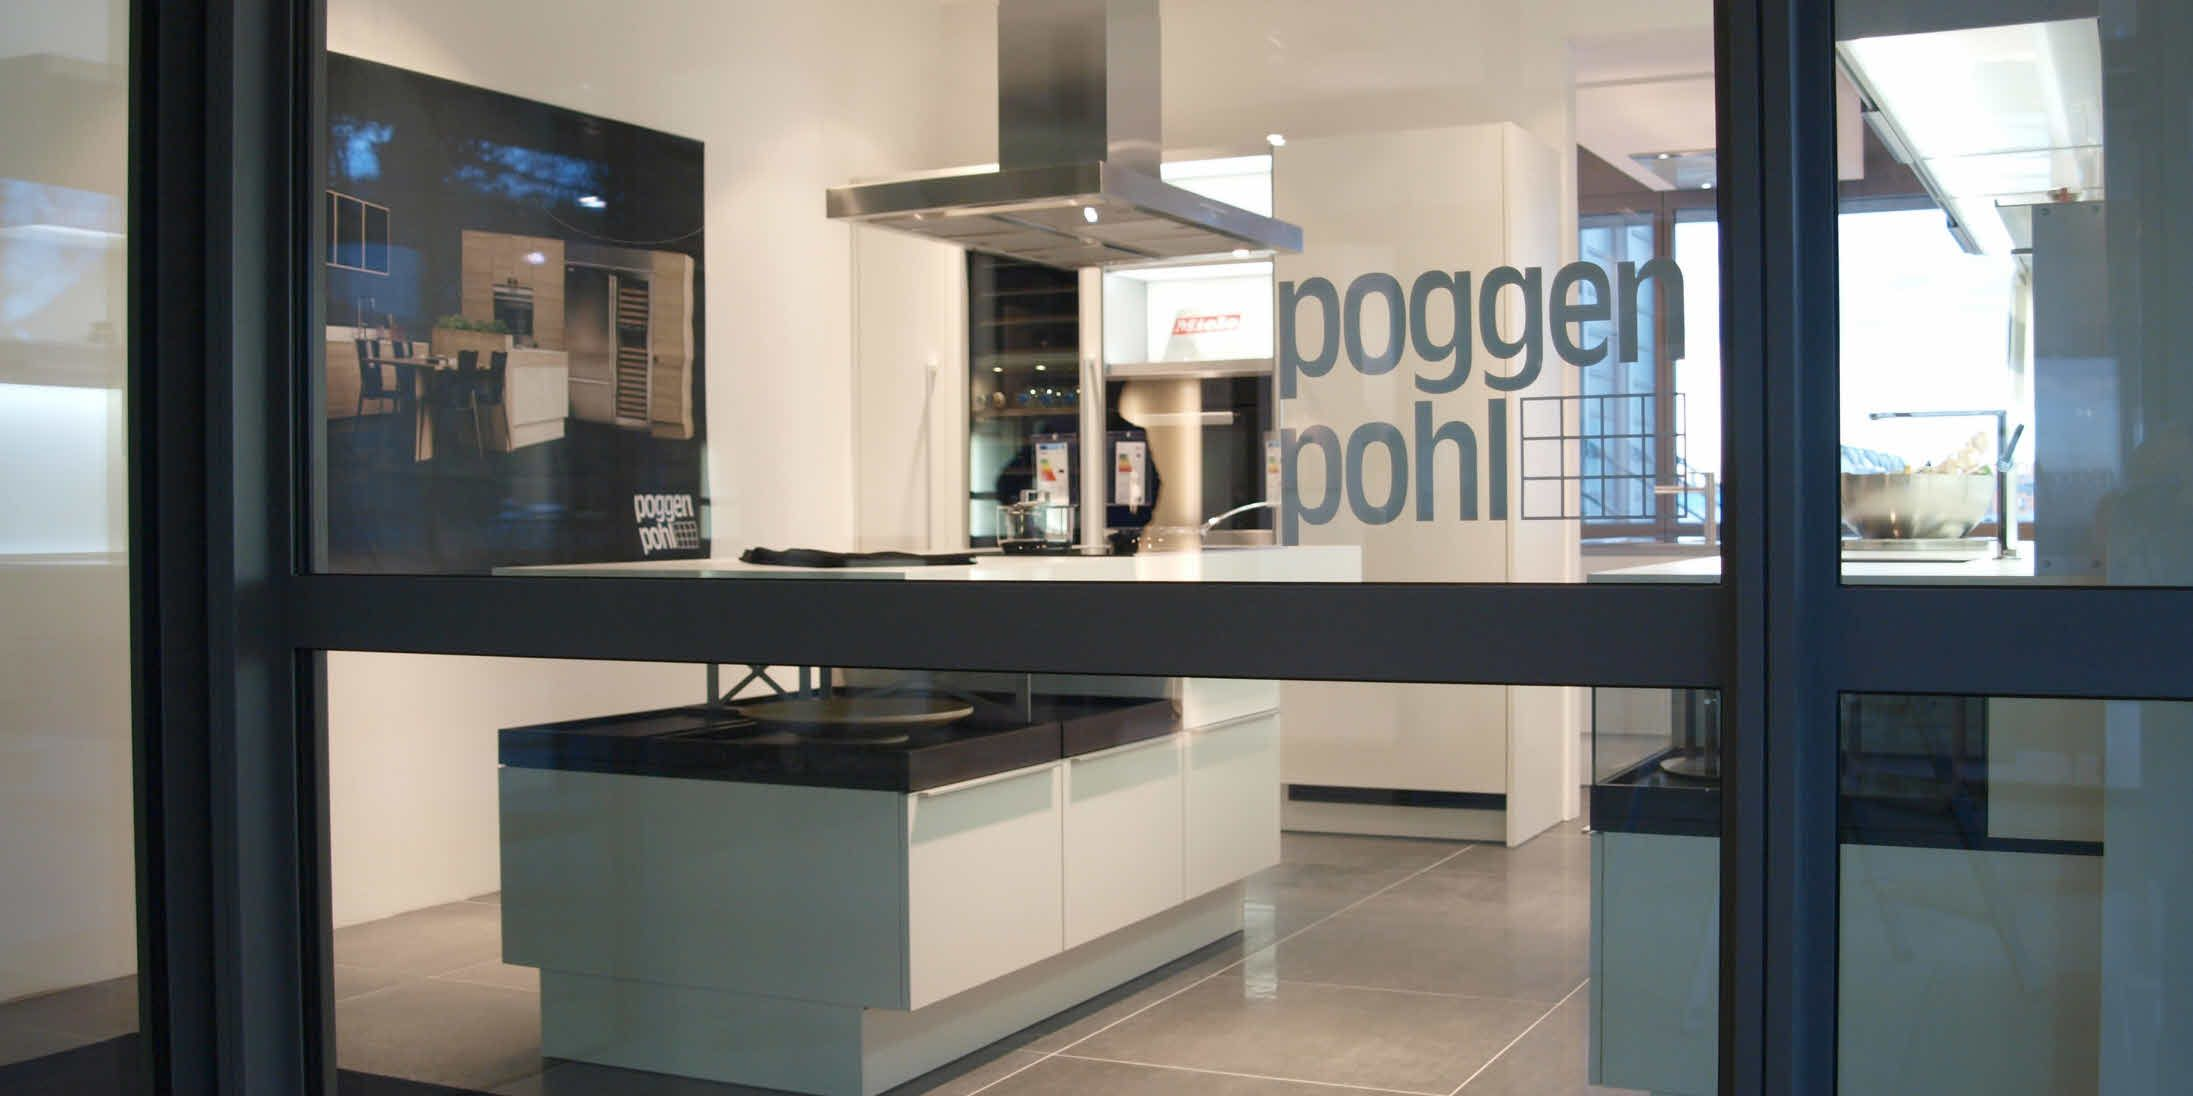 Poggenpohl Studio Freiburg, Germany